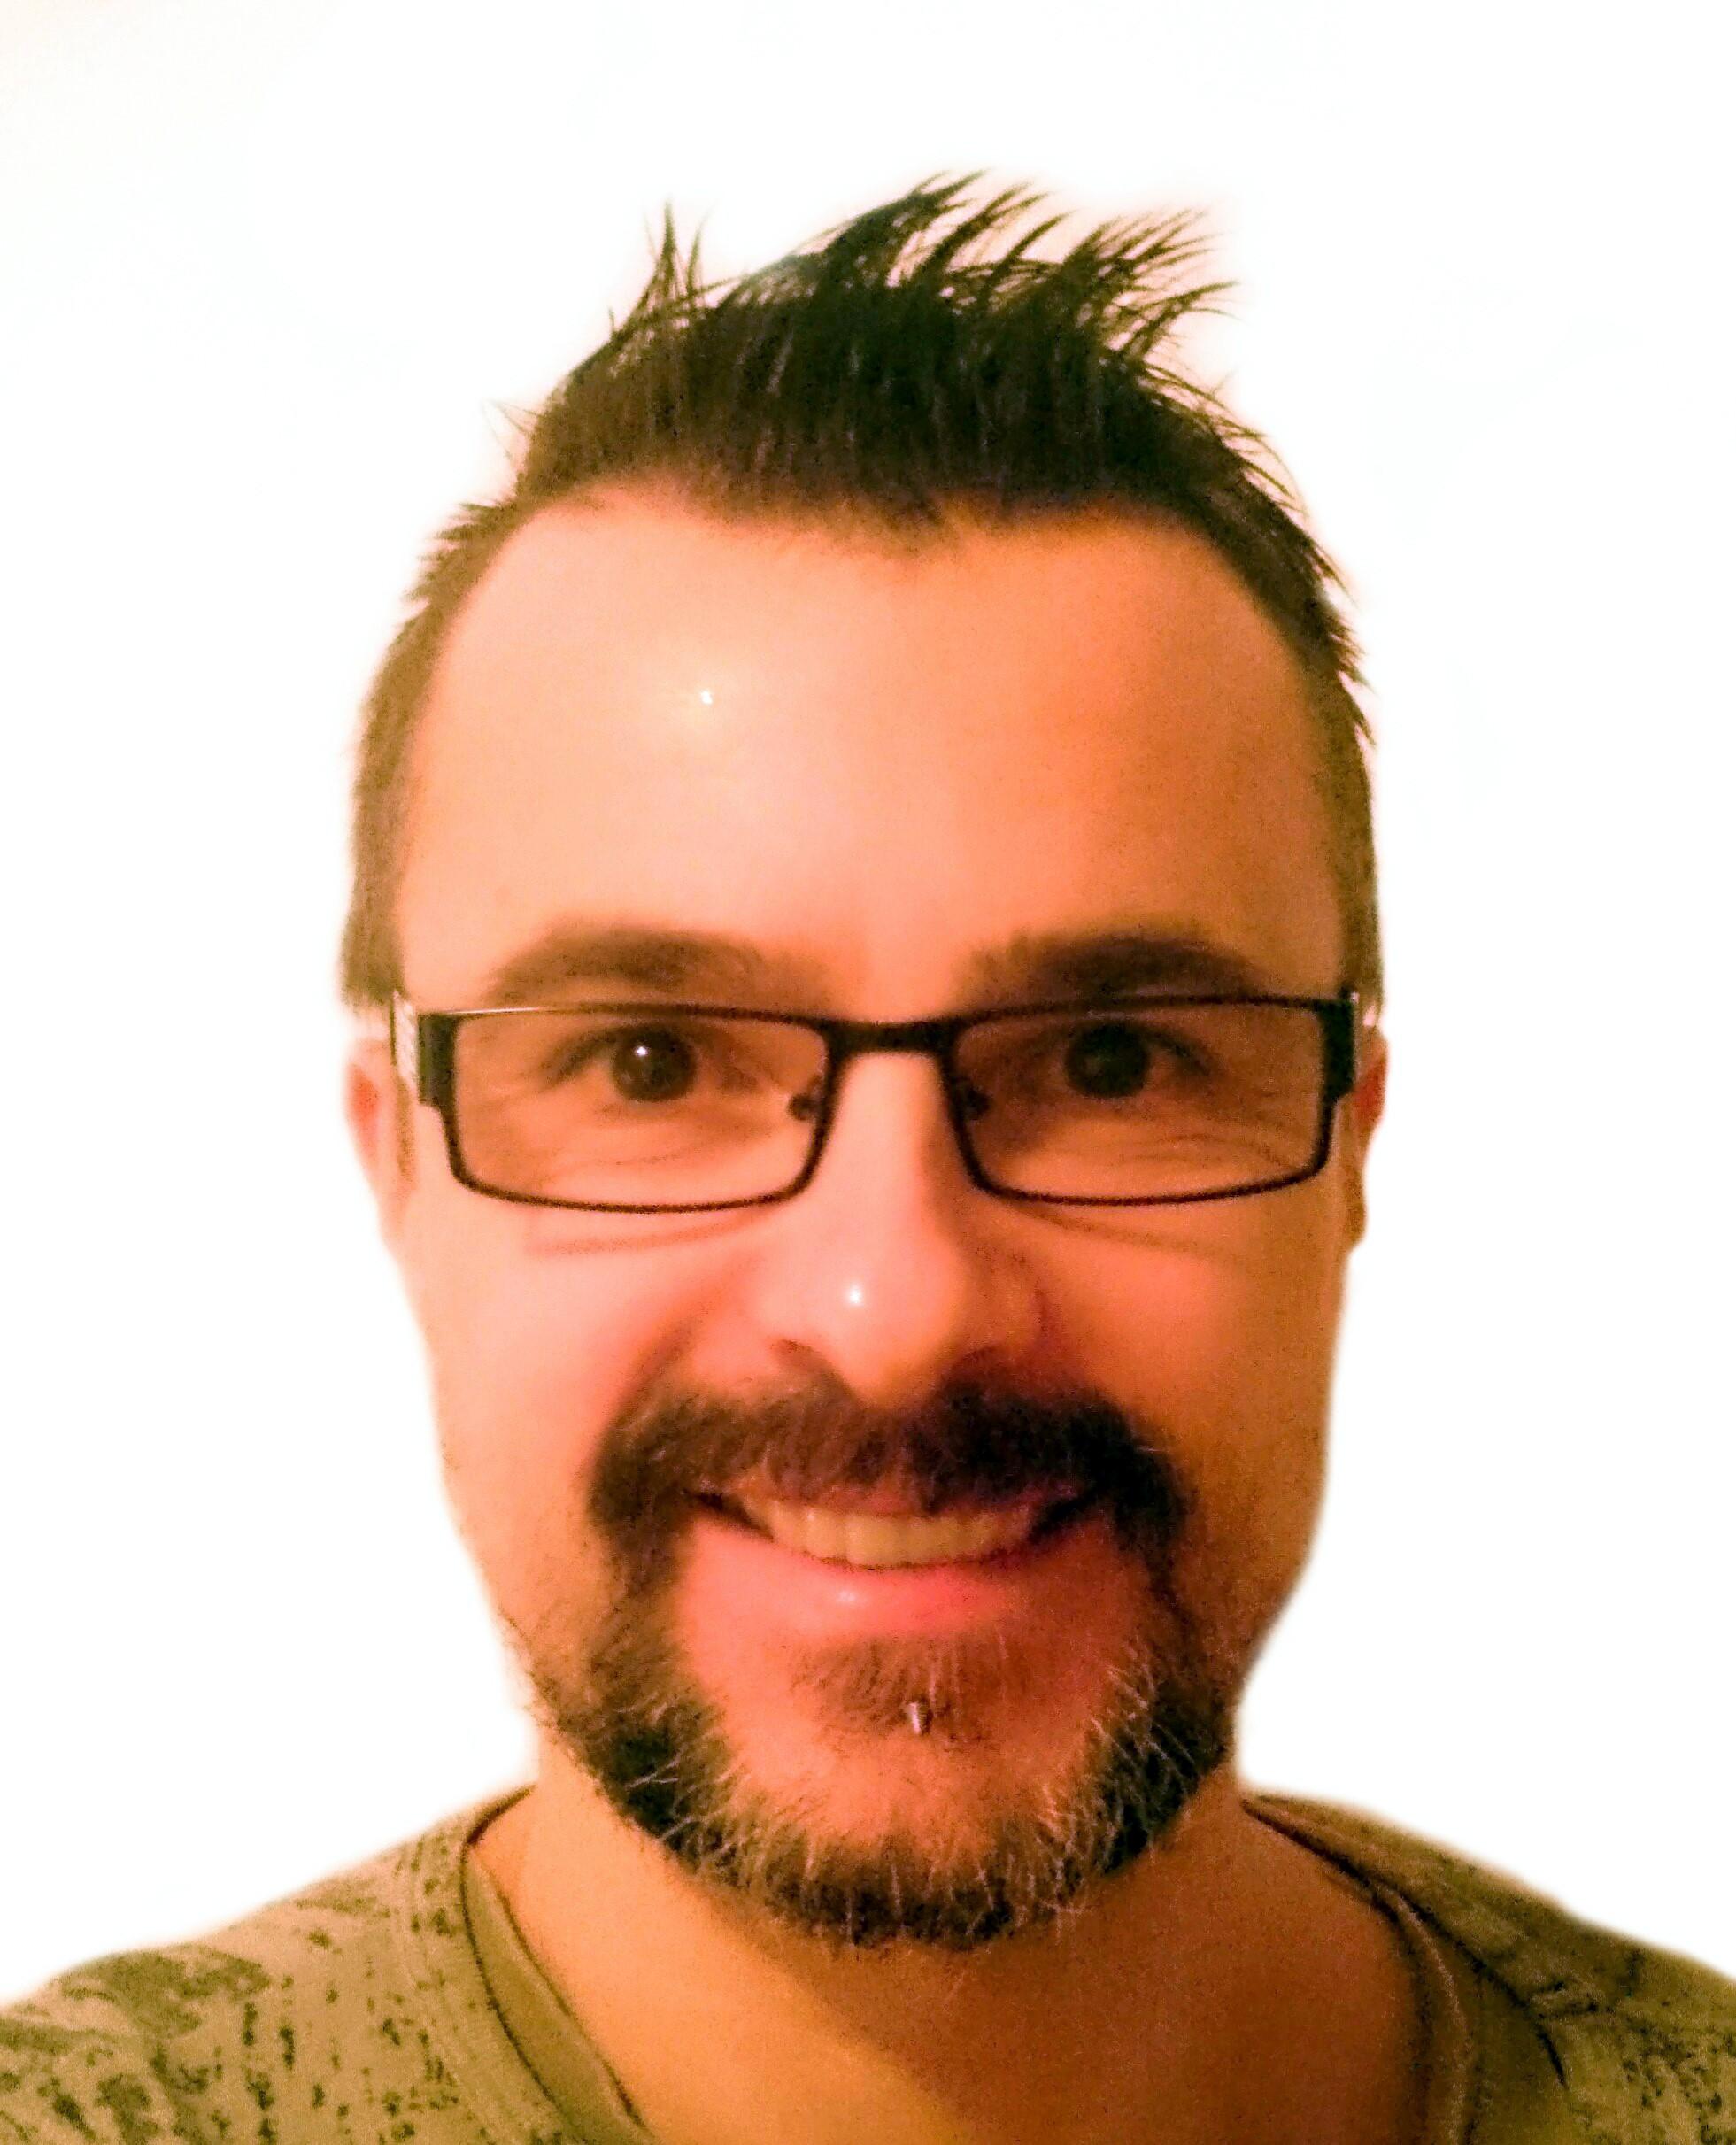 Bc. Radoslav Pleško